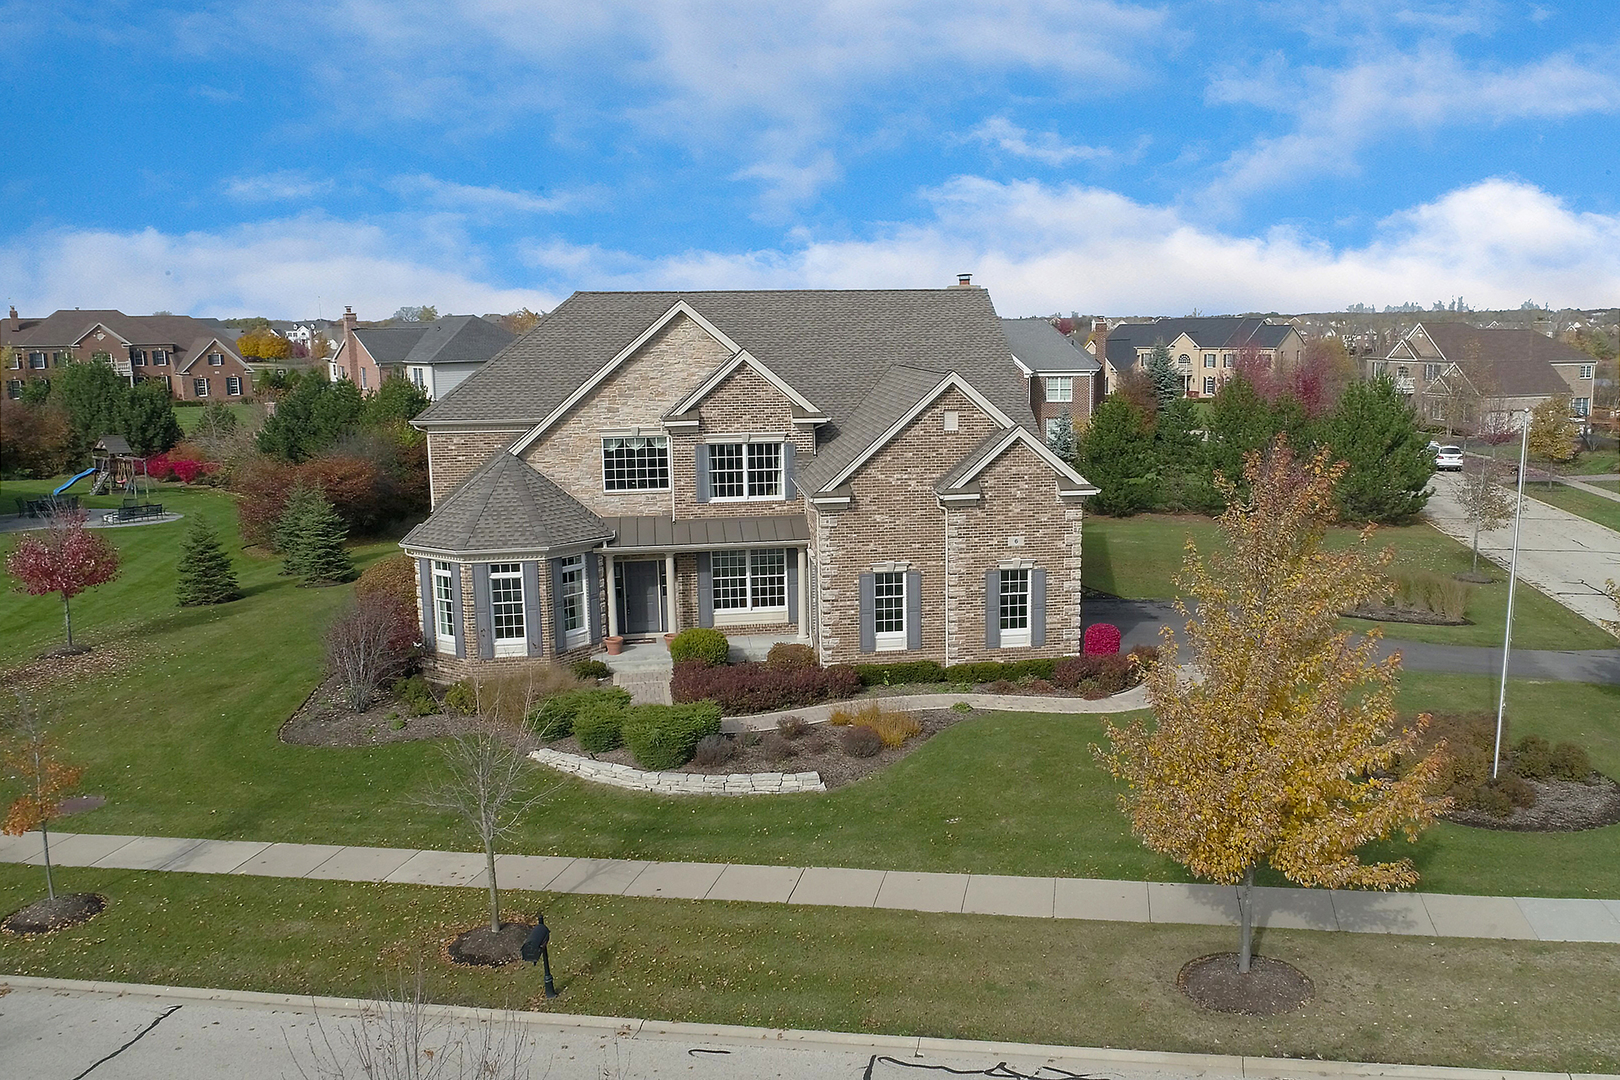 6 Doral Drive, Hawthorn Woods, Illinois 60047